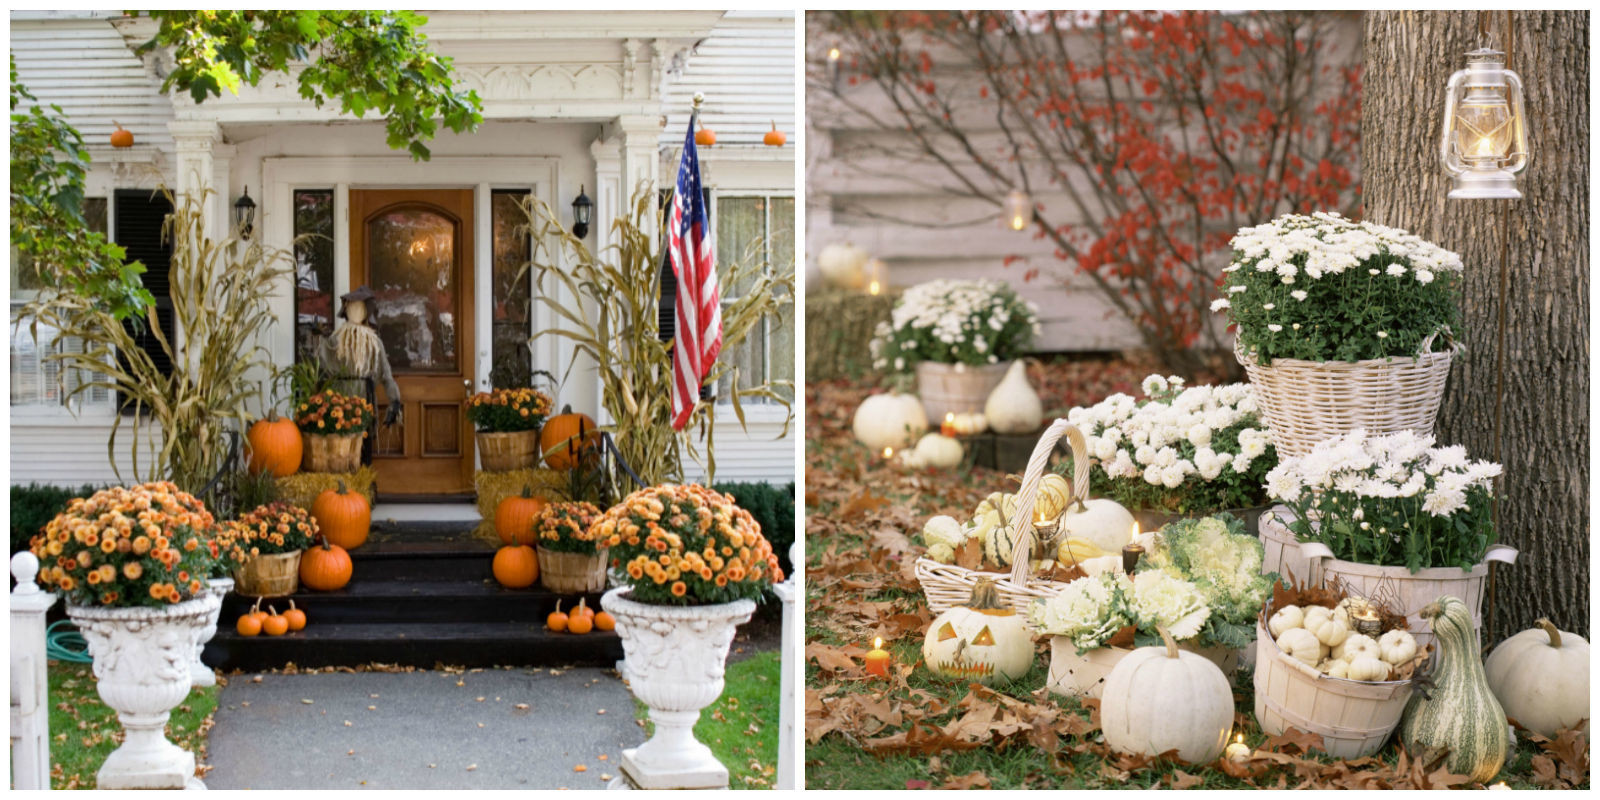 Halloween Decoration Outdoor  25 Outdoor Halloween Decorations Porch Decorating Ideas